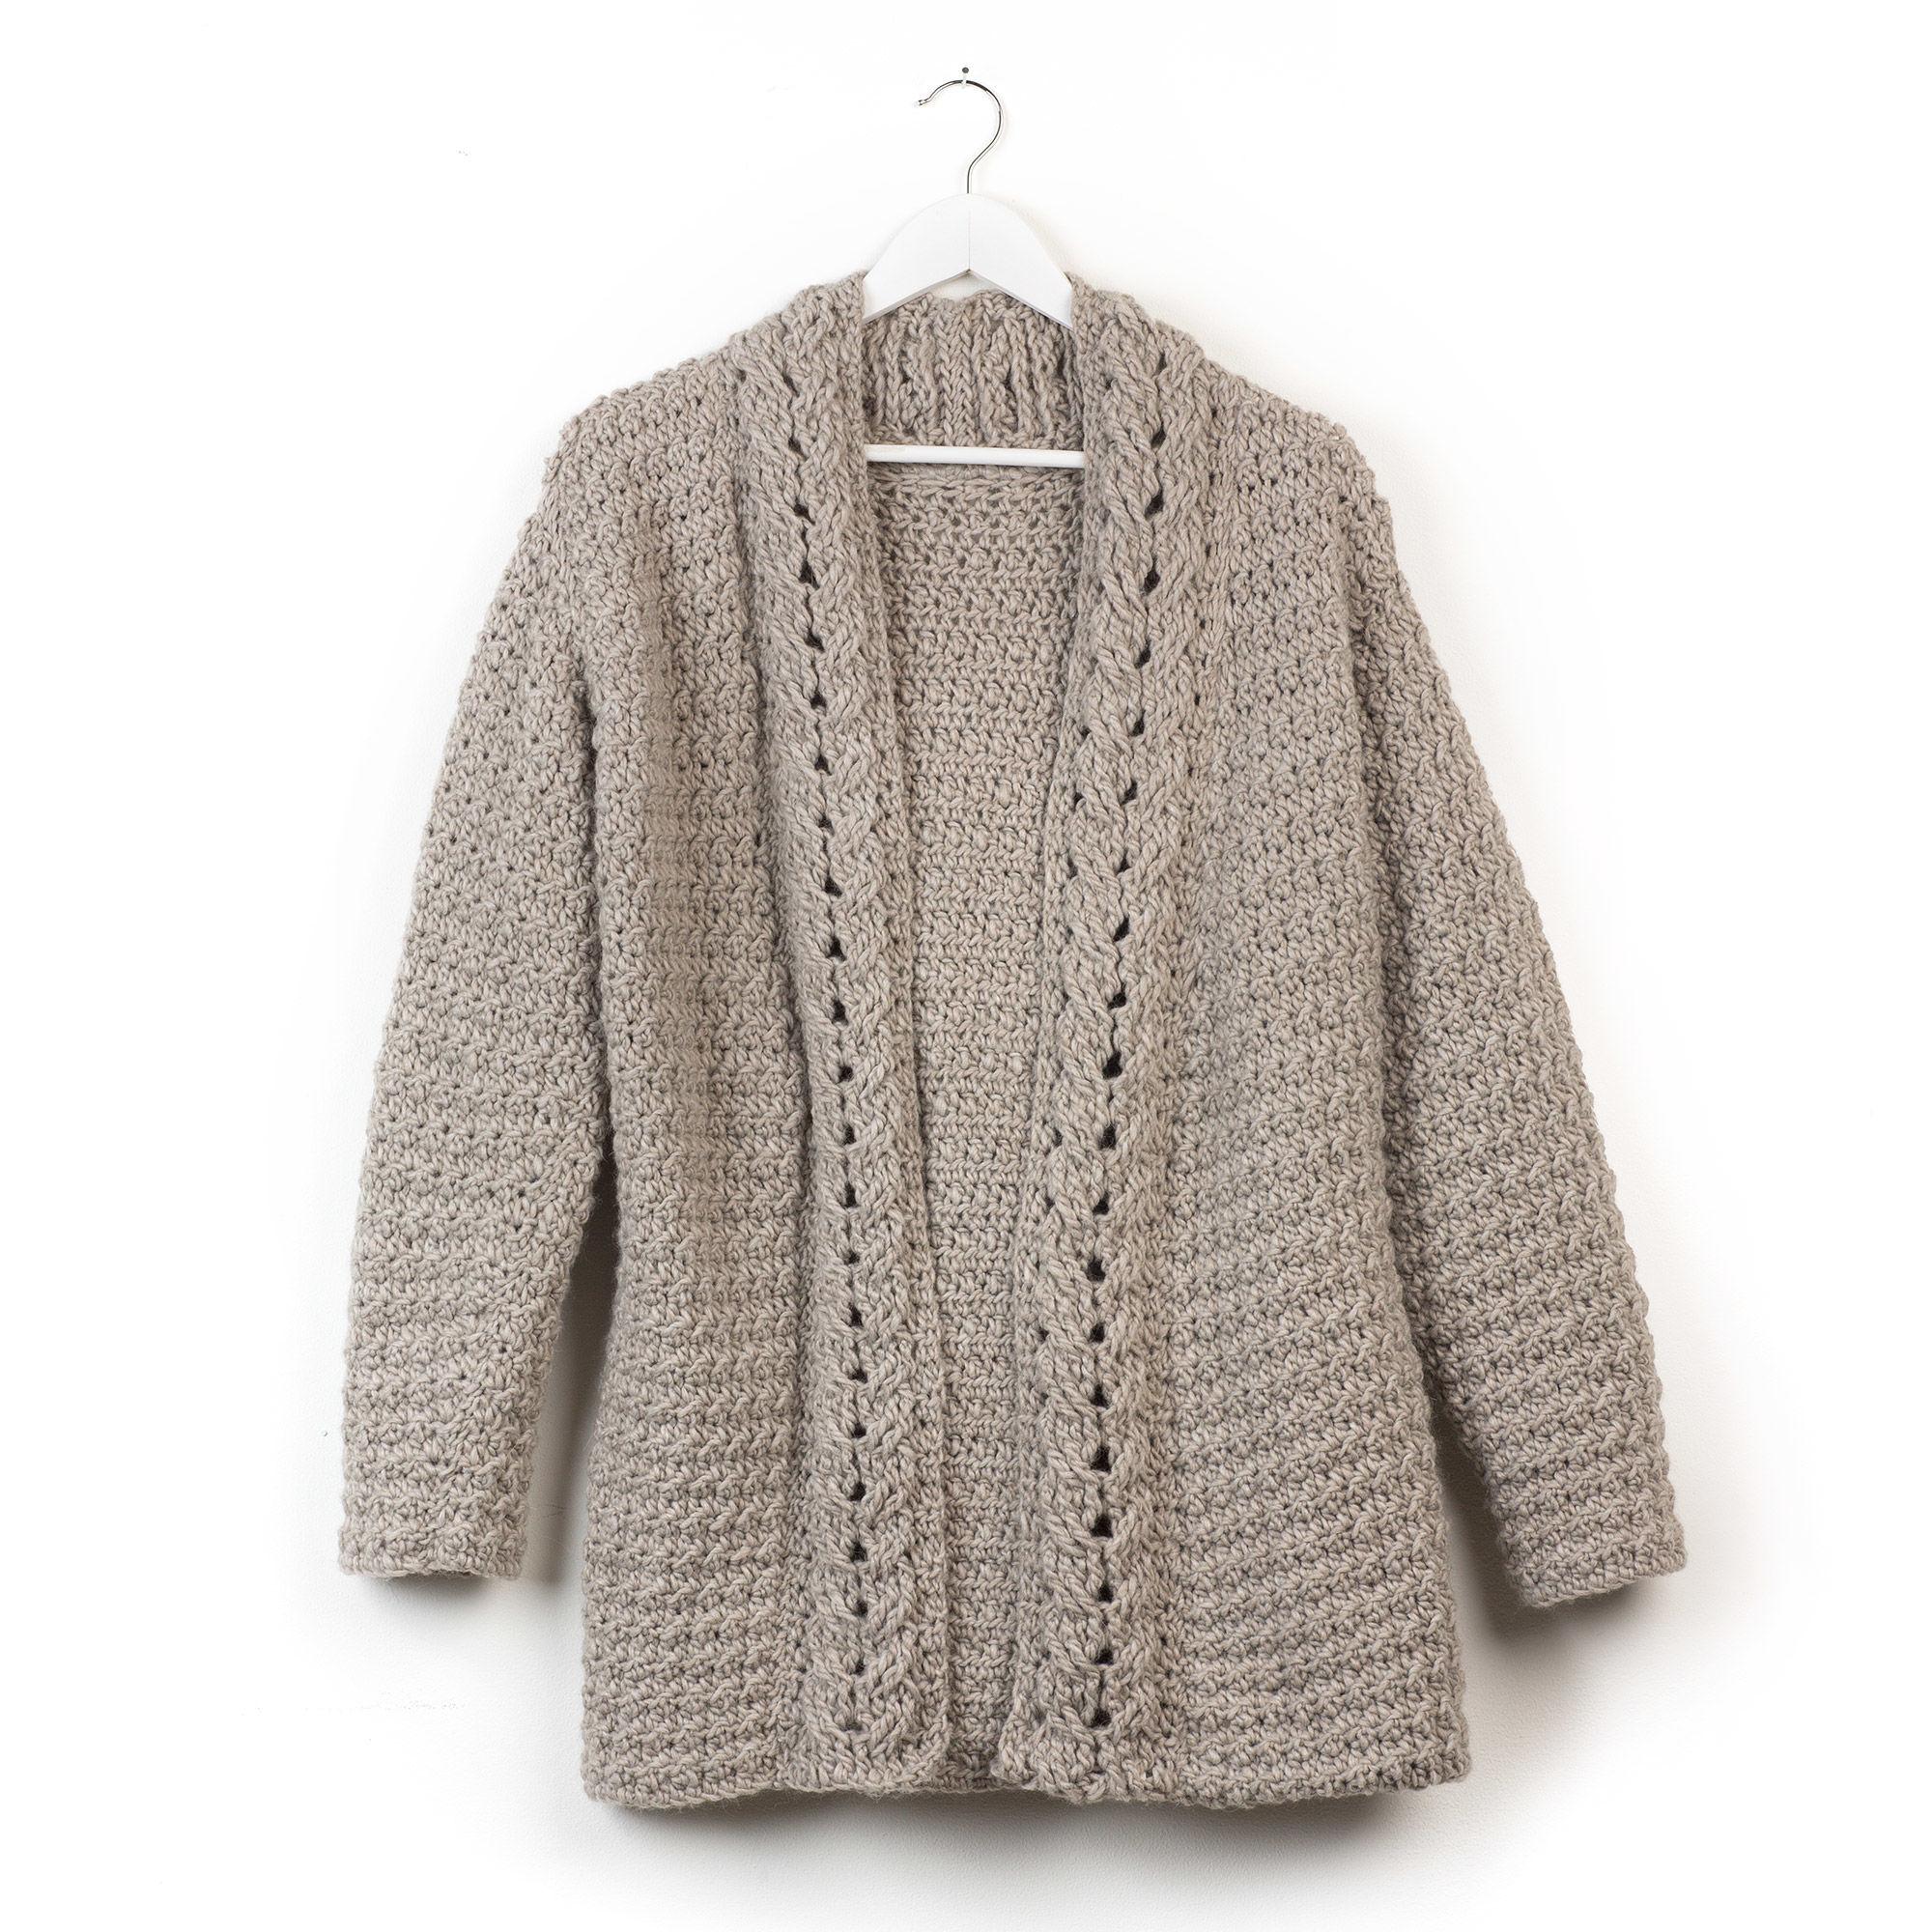 Patons Slouchy Crochet Cardigan, XS/S | Yarnspirations